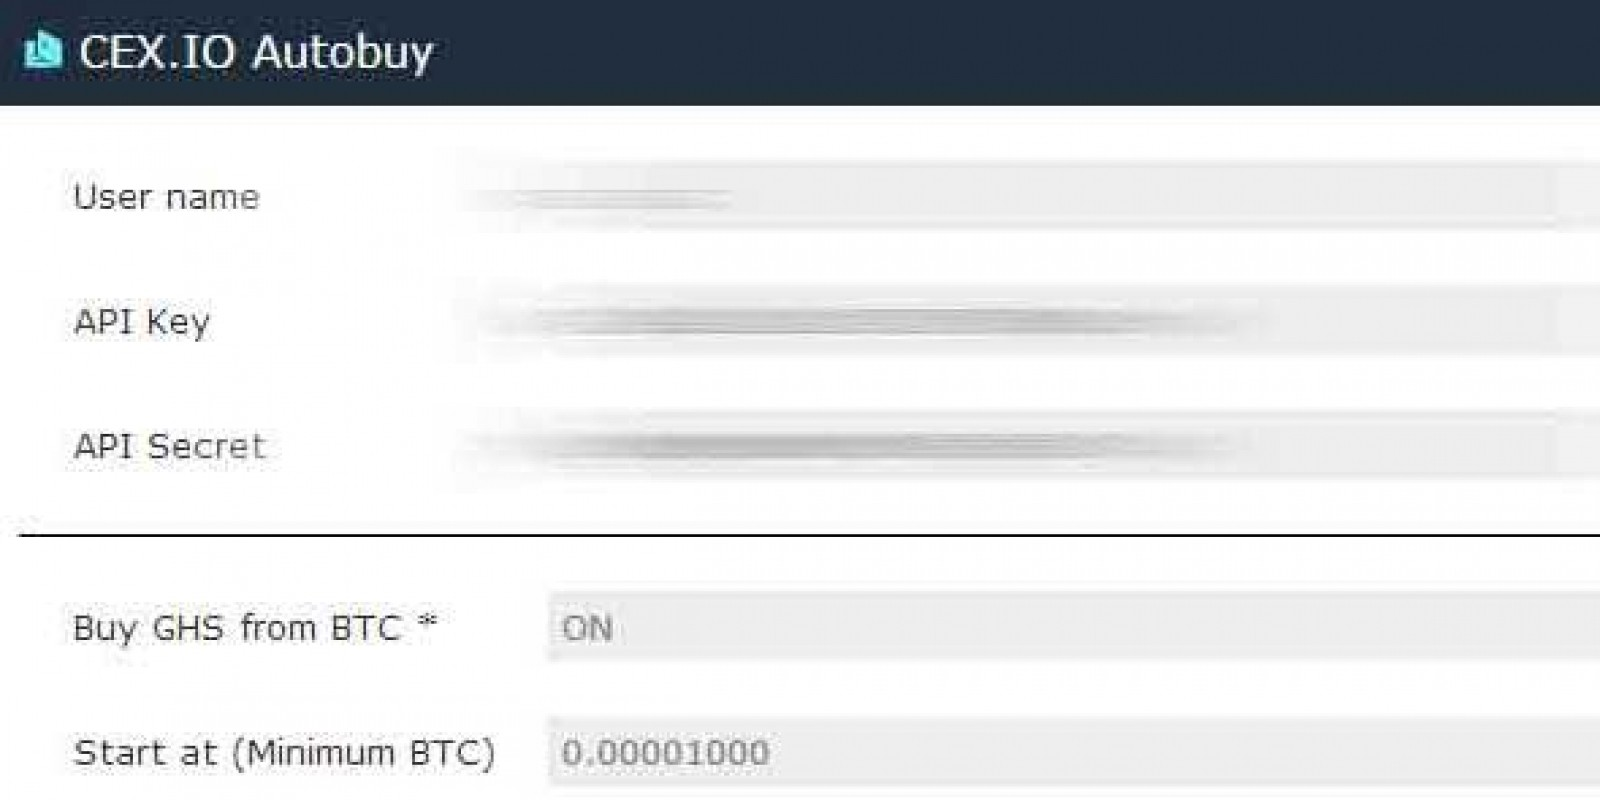 CEX.IO Bitcoin Autobuy GHS Script using Javascript